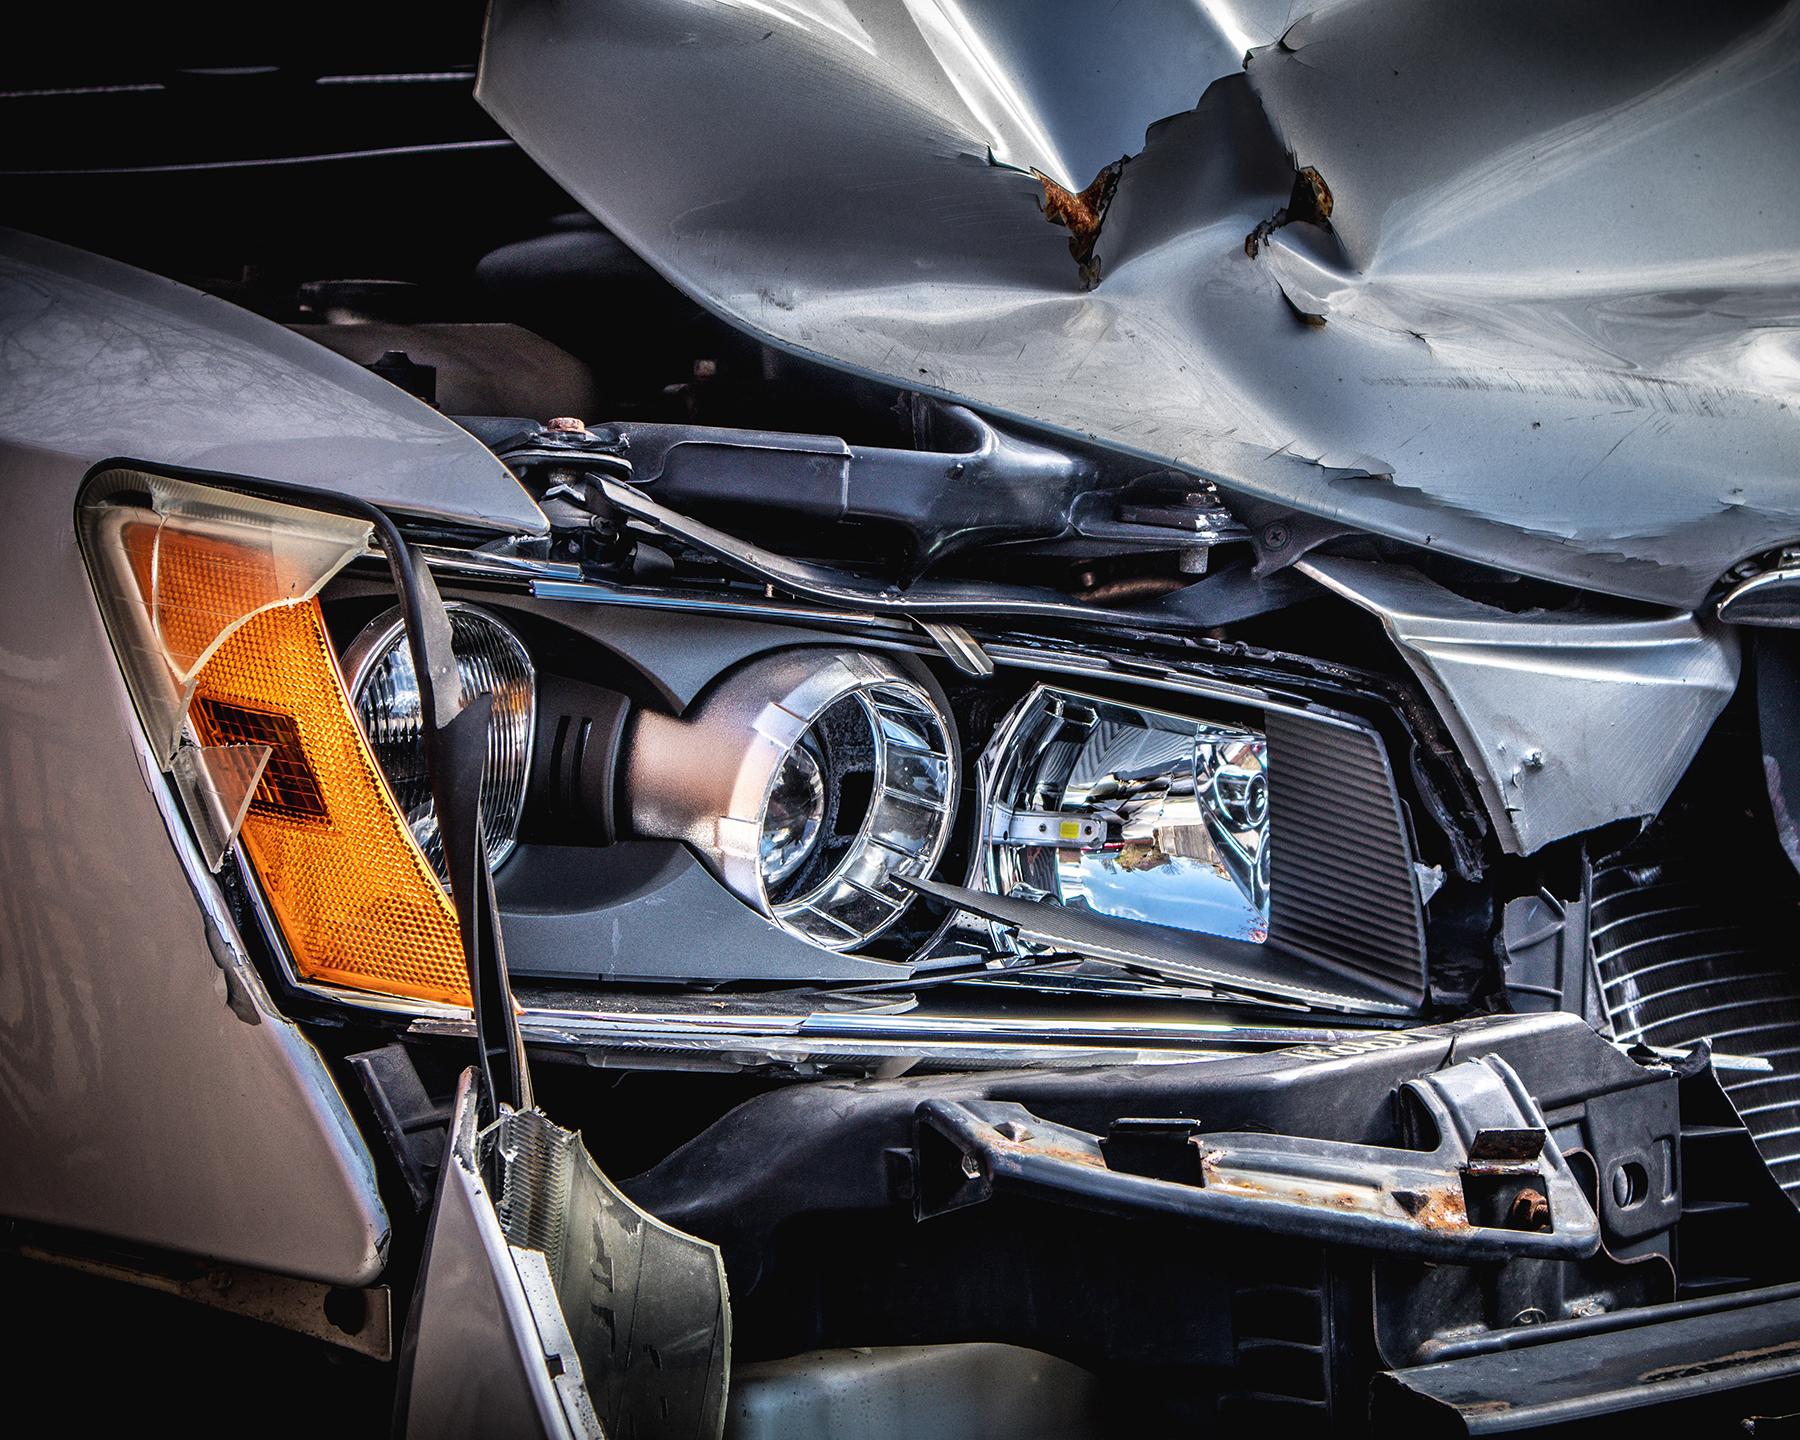 Headline area on a grey car after a car accident - Spitzer Legal Automotive Accident Practice Area